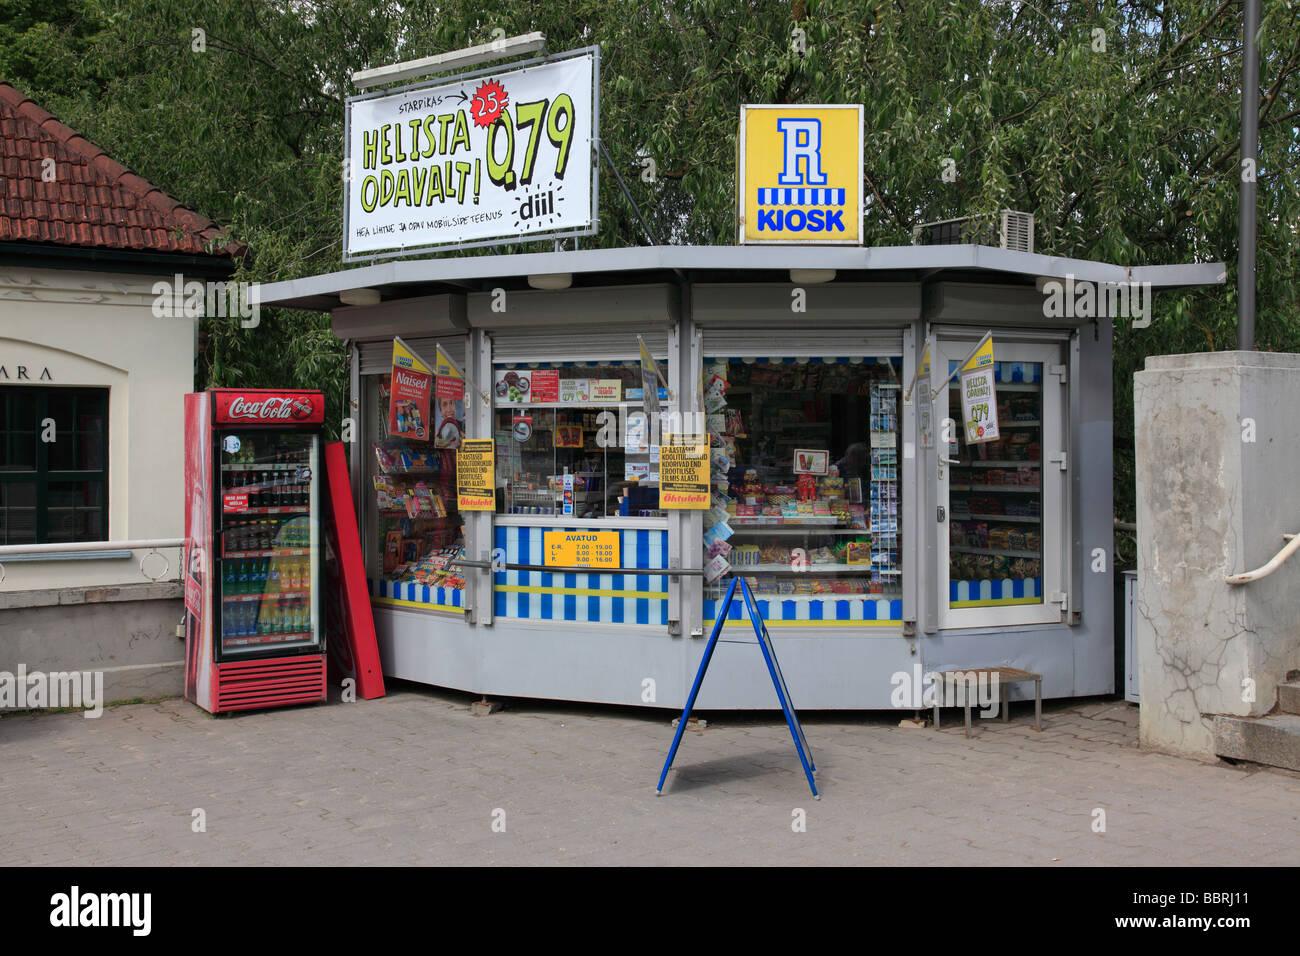 Kiosk at the city of Tartu, Estonia, Baltic State, Eastern Europe. Photo by Willy Matheisl - Stock Image